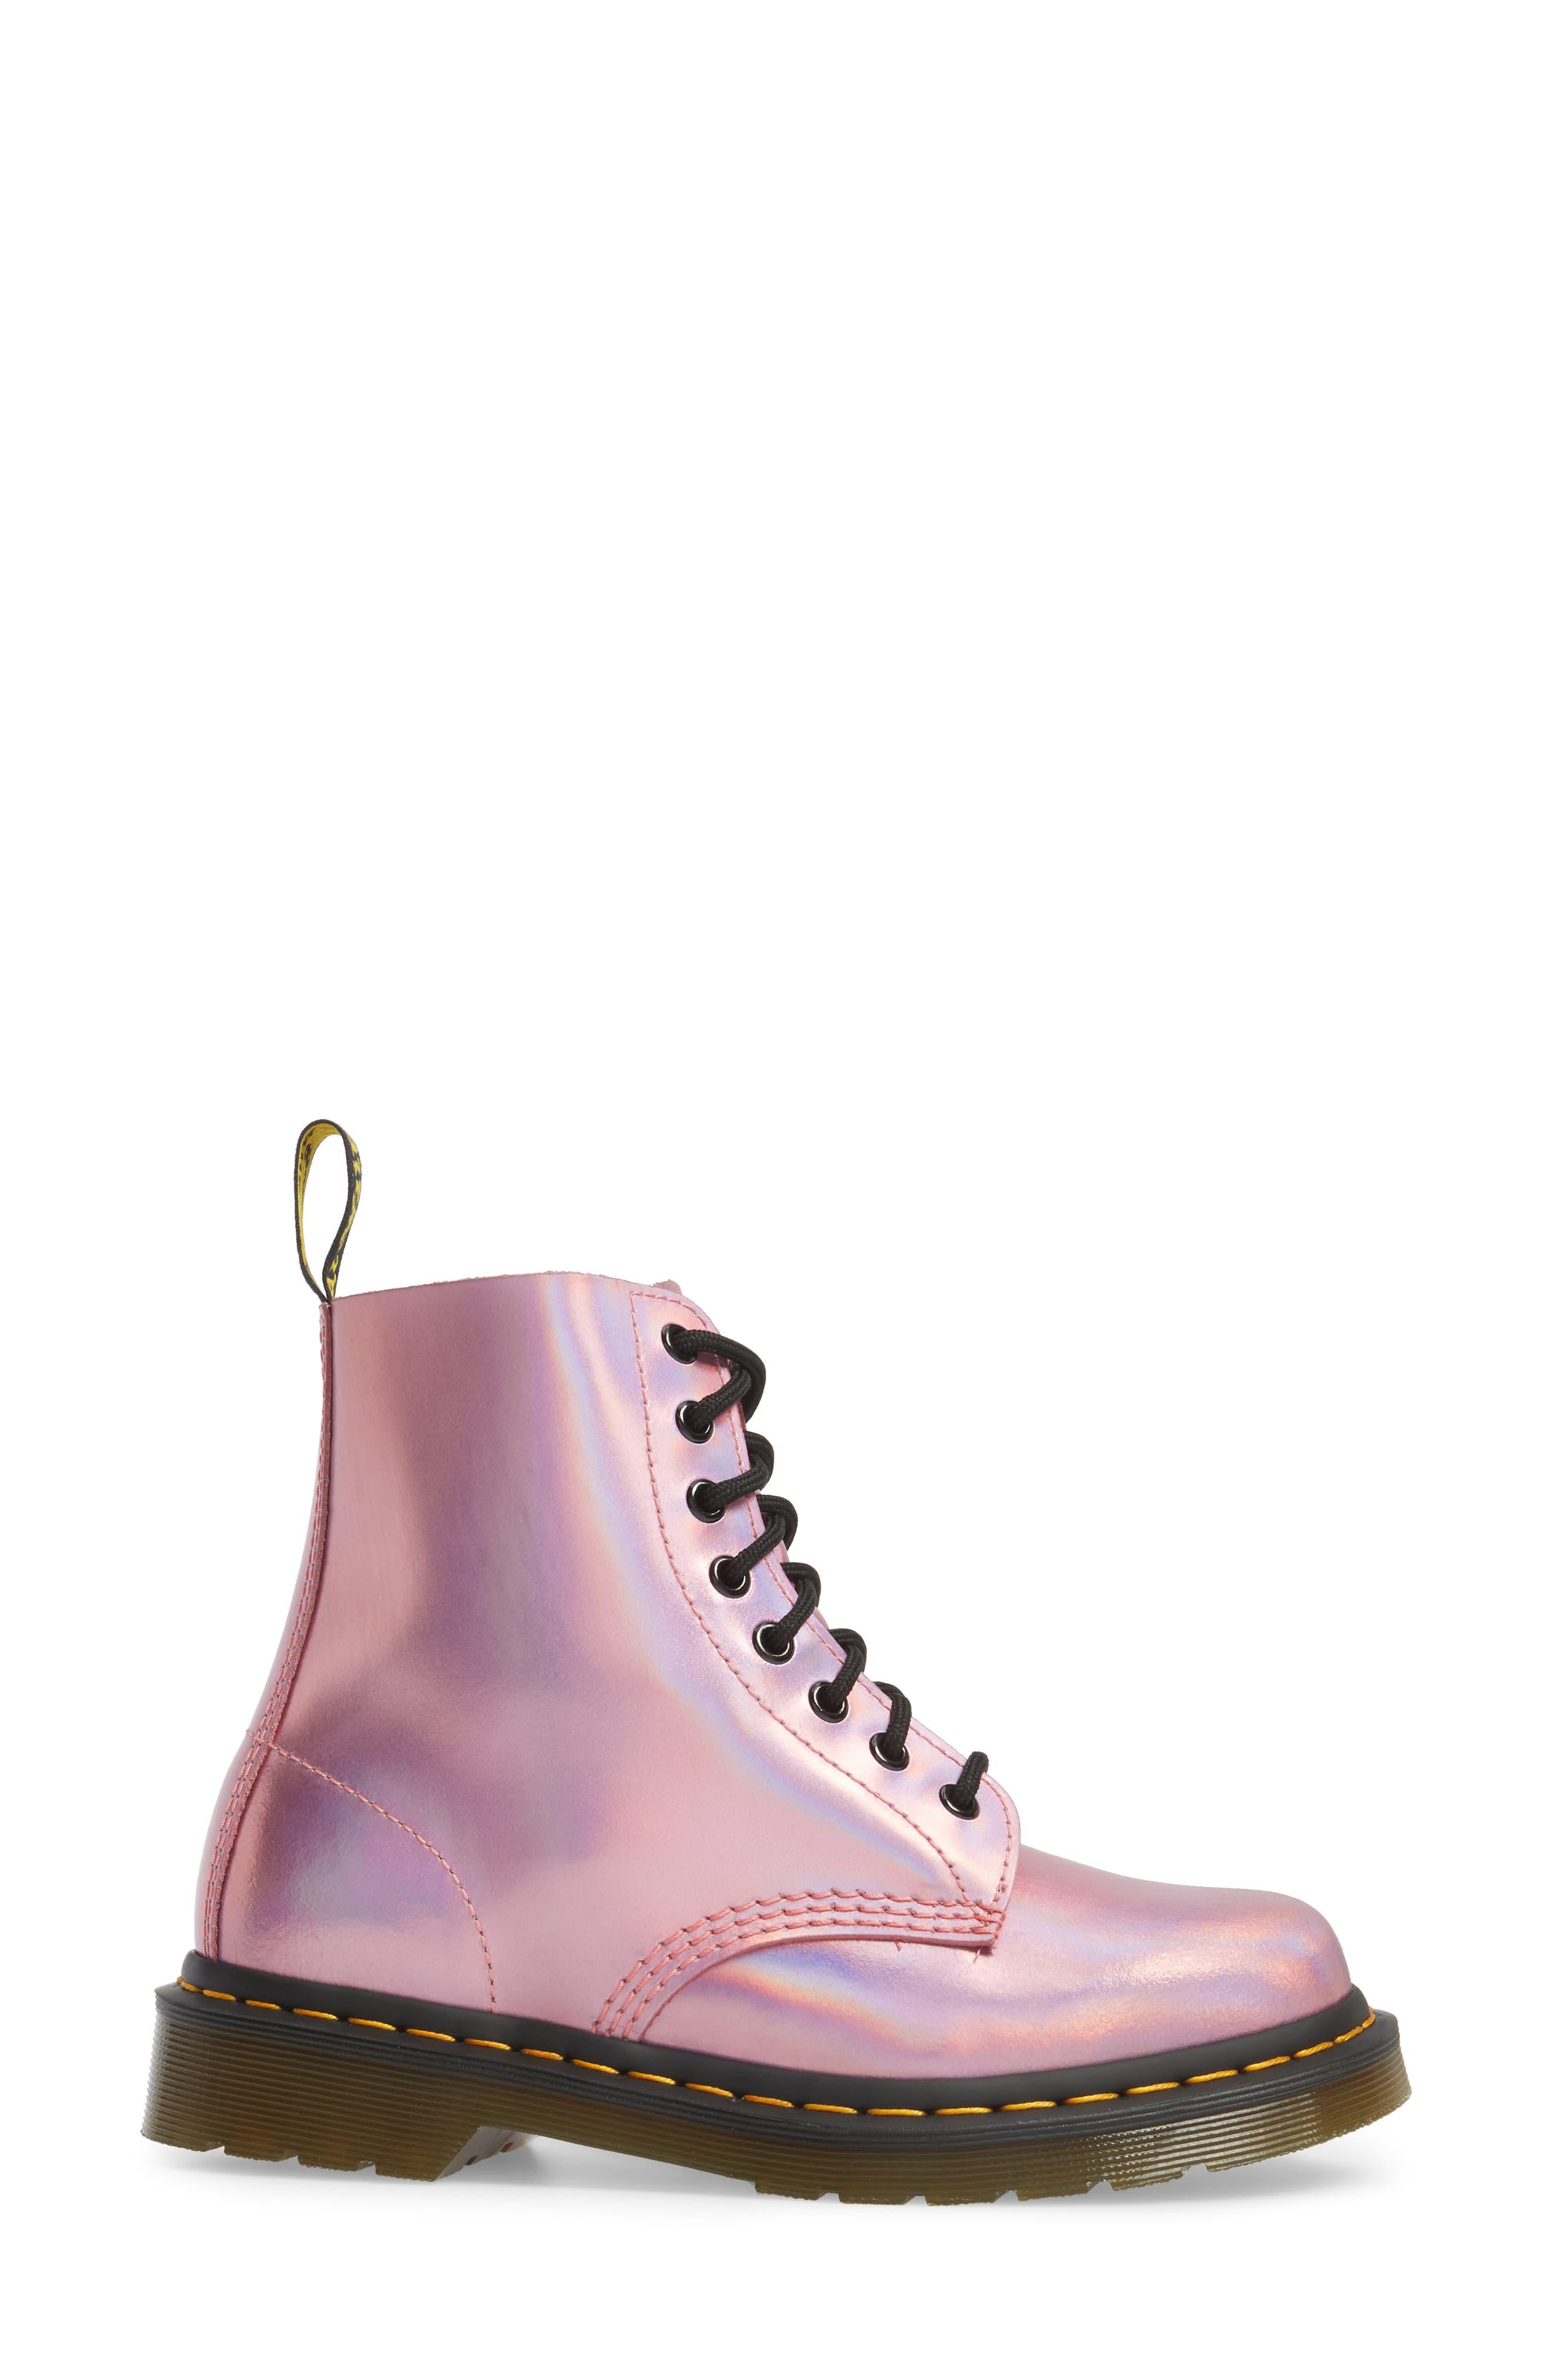 Pascal Metallic Combat Boot,                             Alternate thumbnail 4, color,                             Pink Metallic Leather